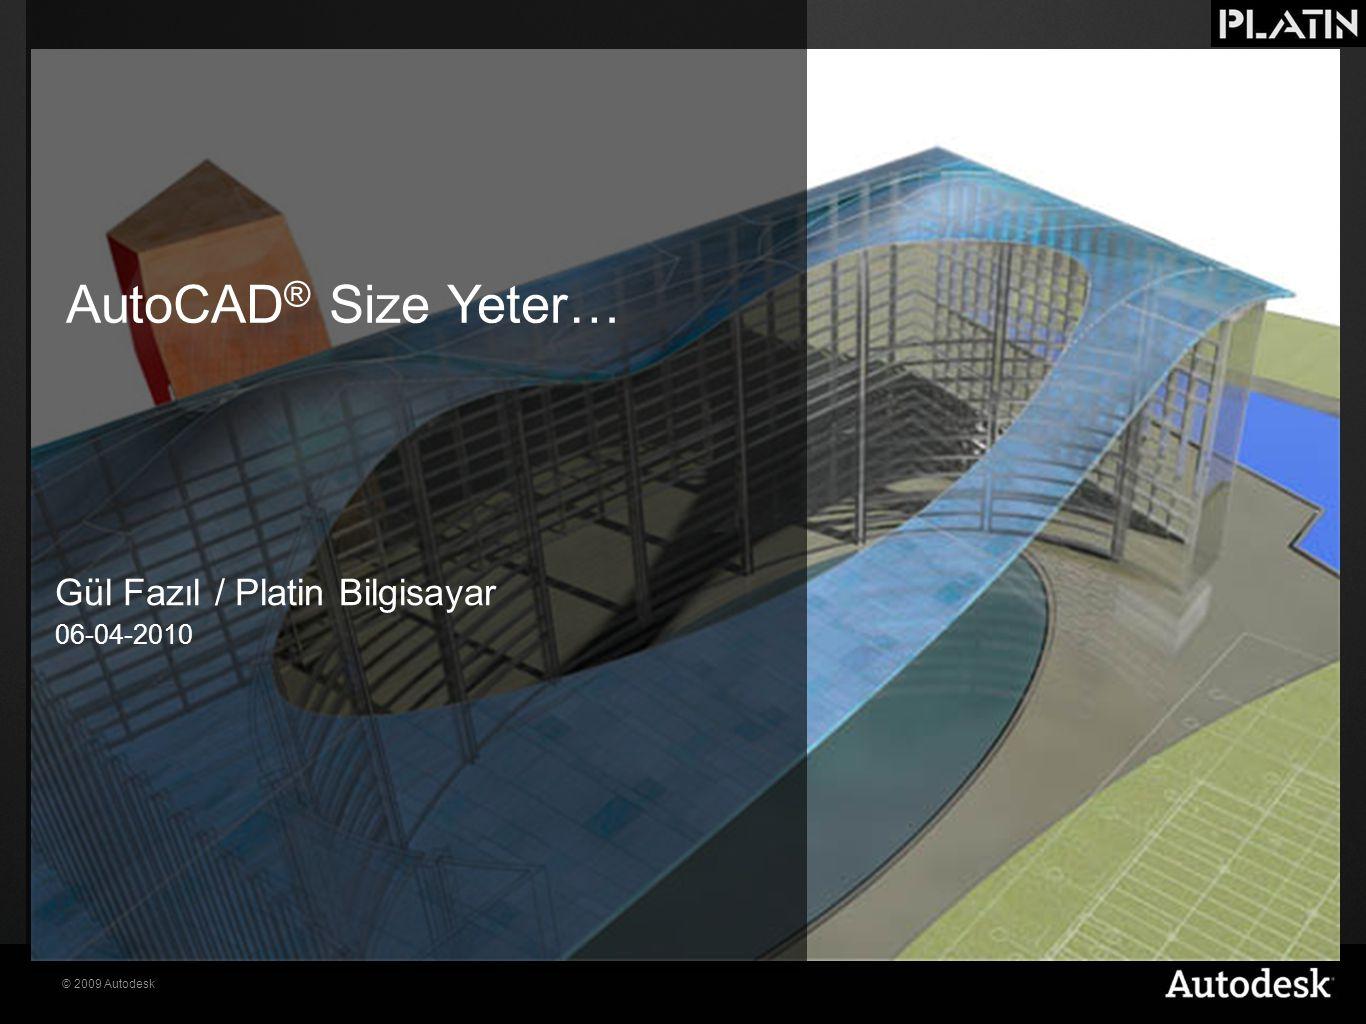 © 2009 Autodesk AutoCAD ® Size Yeter… Gül Fazıl / Platin Bilgisayar 06-04-2010